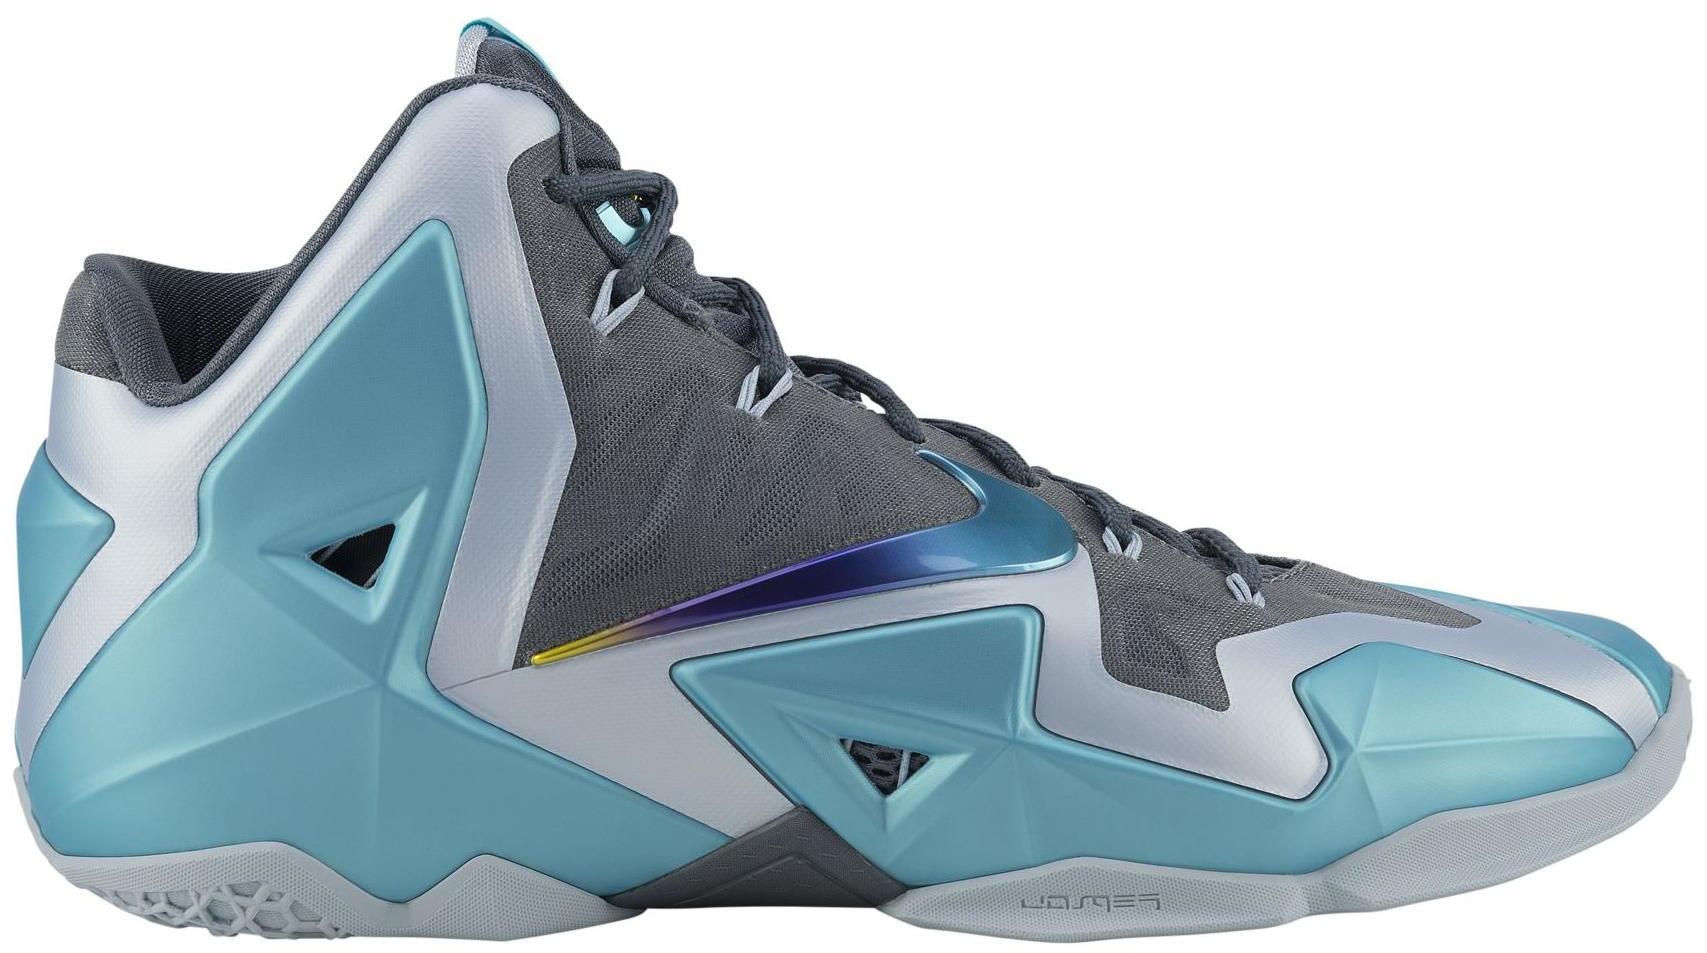 Nike LeBron 11 Gamma Blue - 616175-401